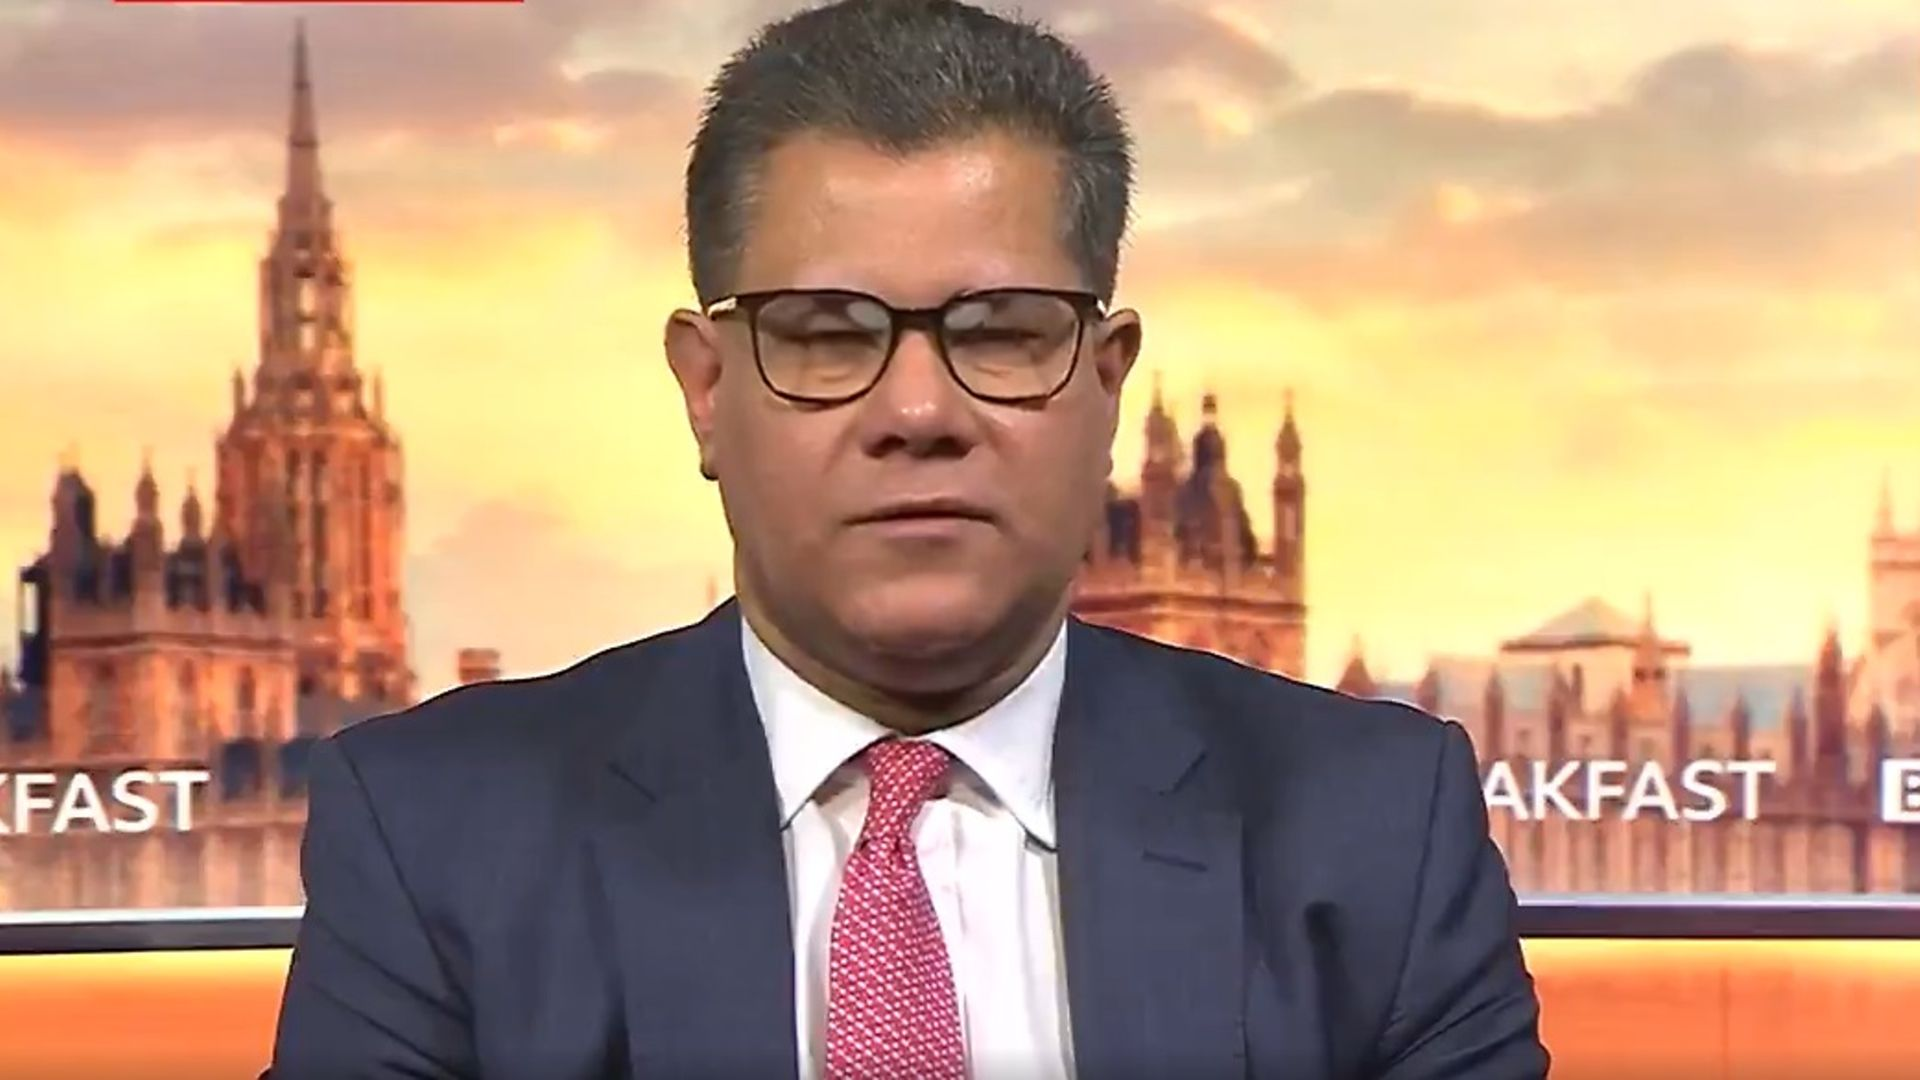 Alok Sharma on BBC Breakfast - Credit: BBC